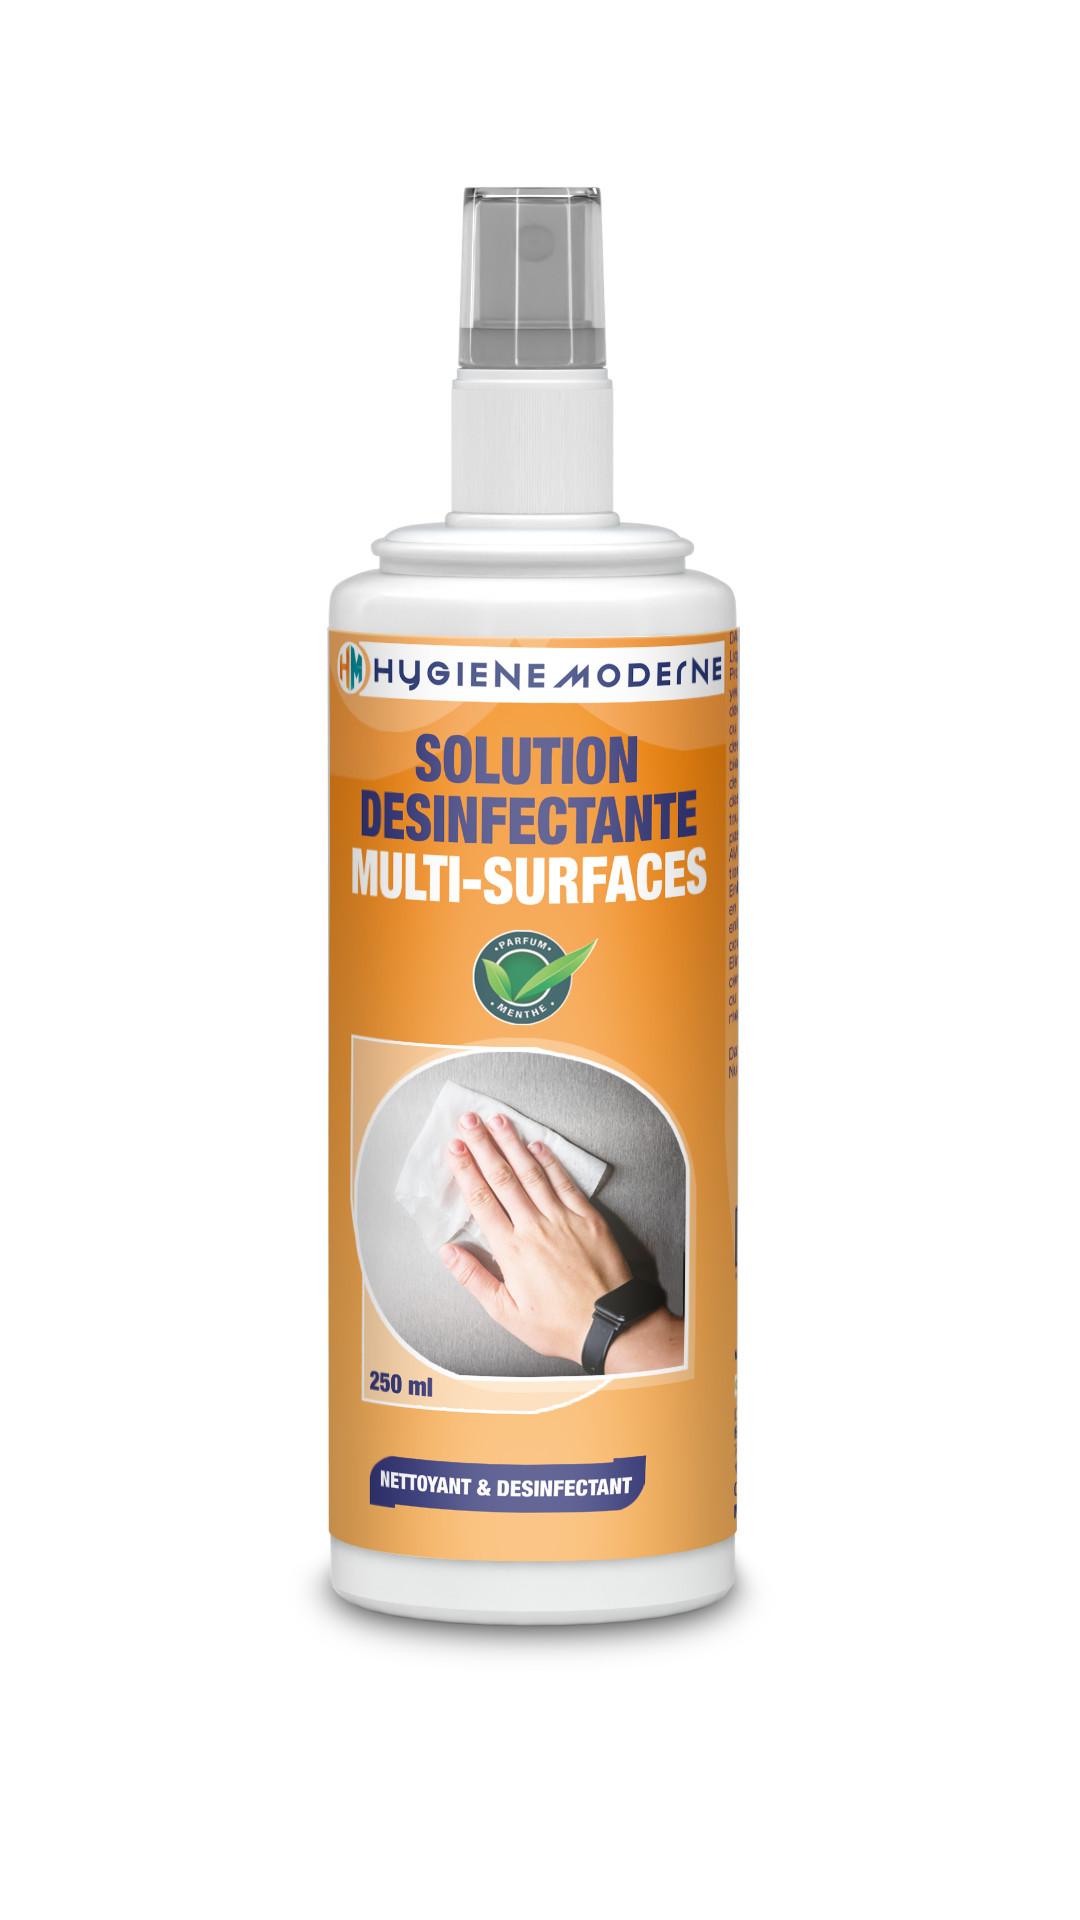 HYGIENE MODERNE Solution désinfectante multi-surface 250 ml